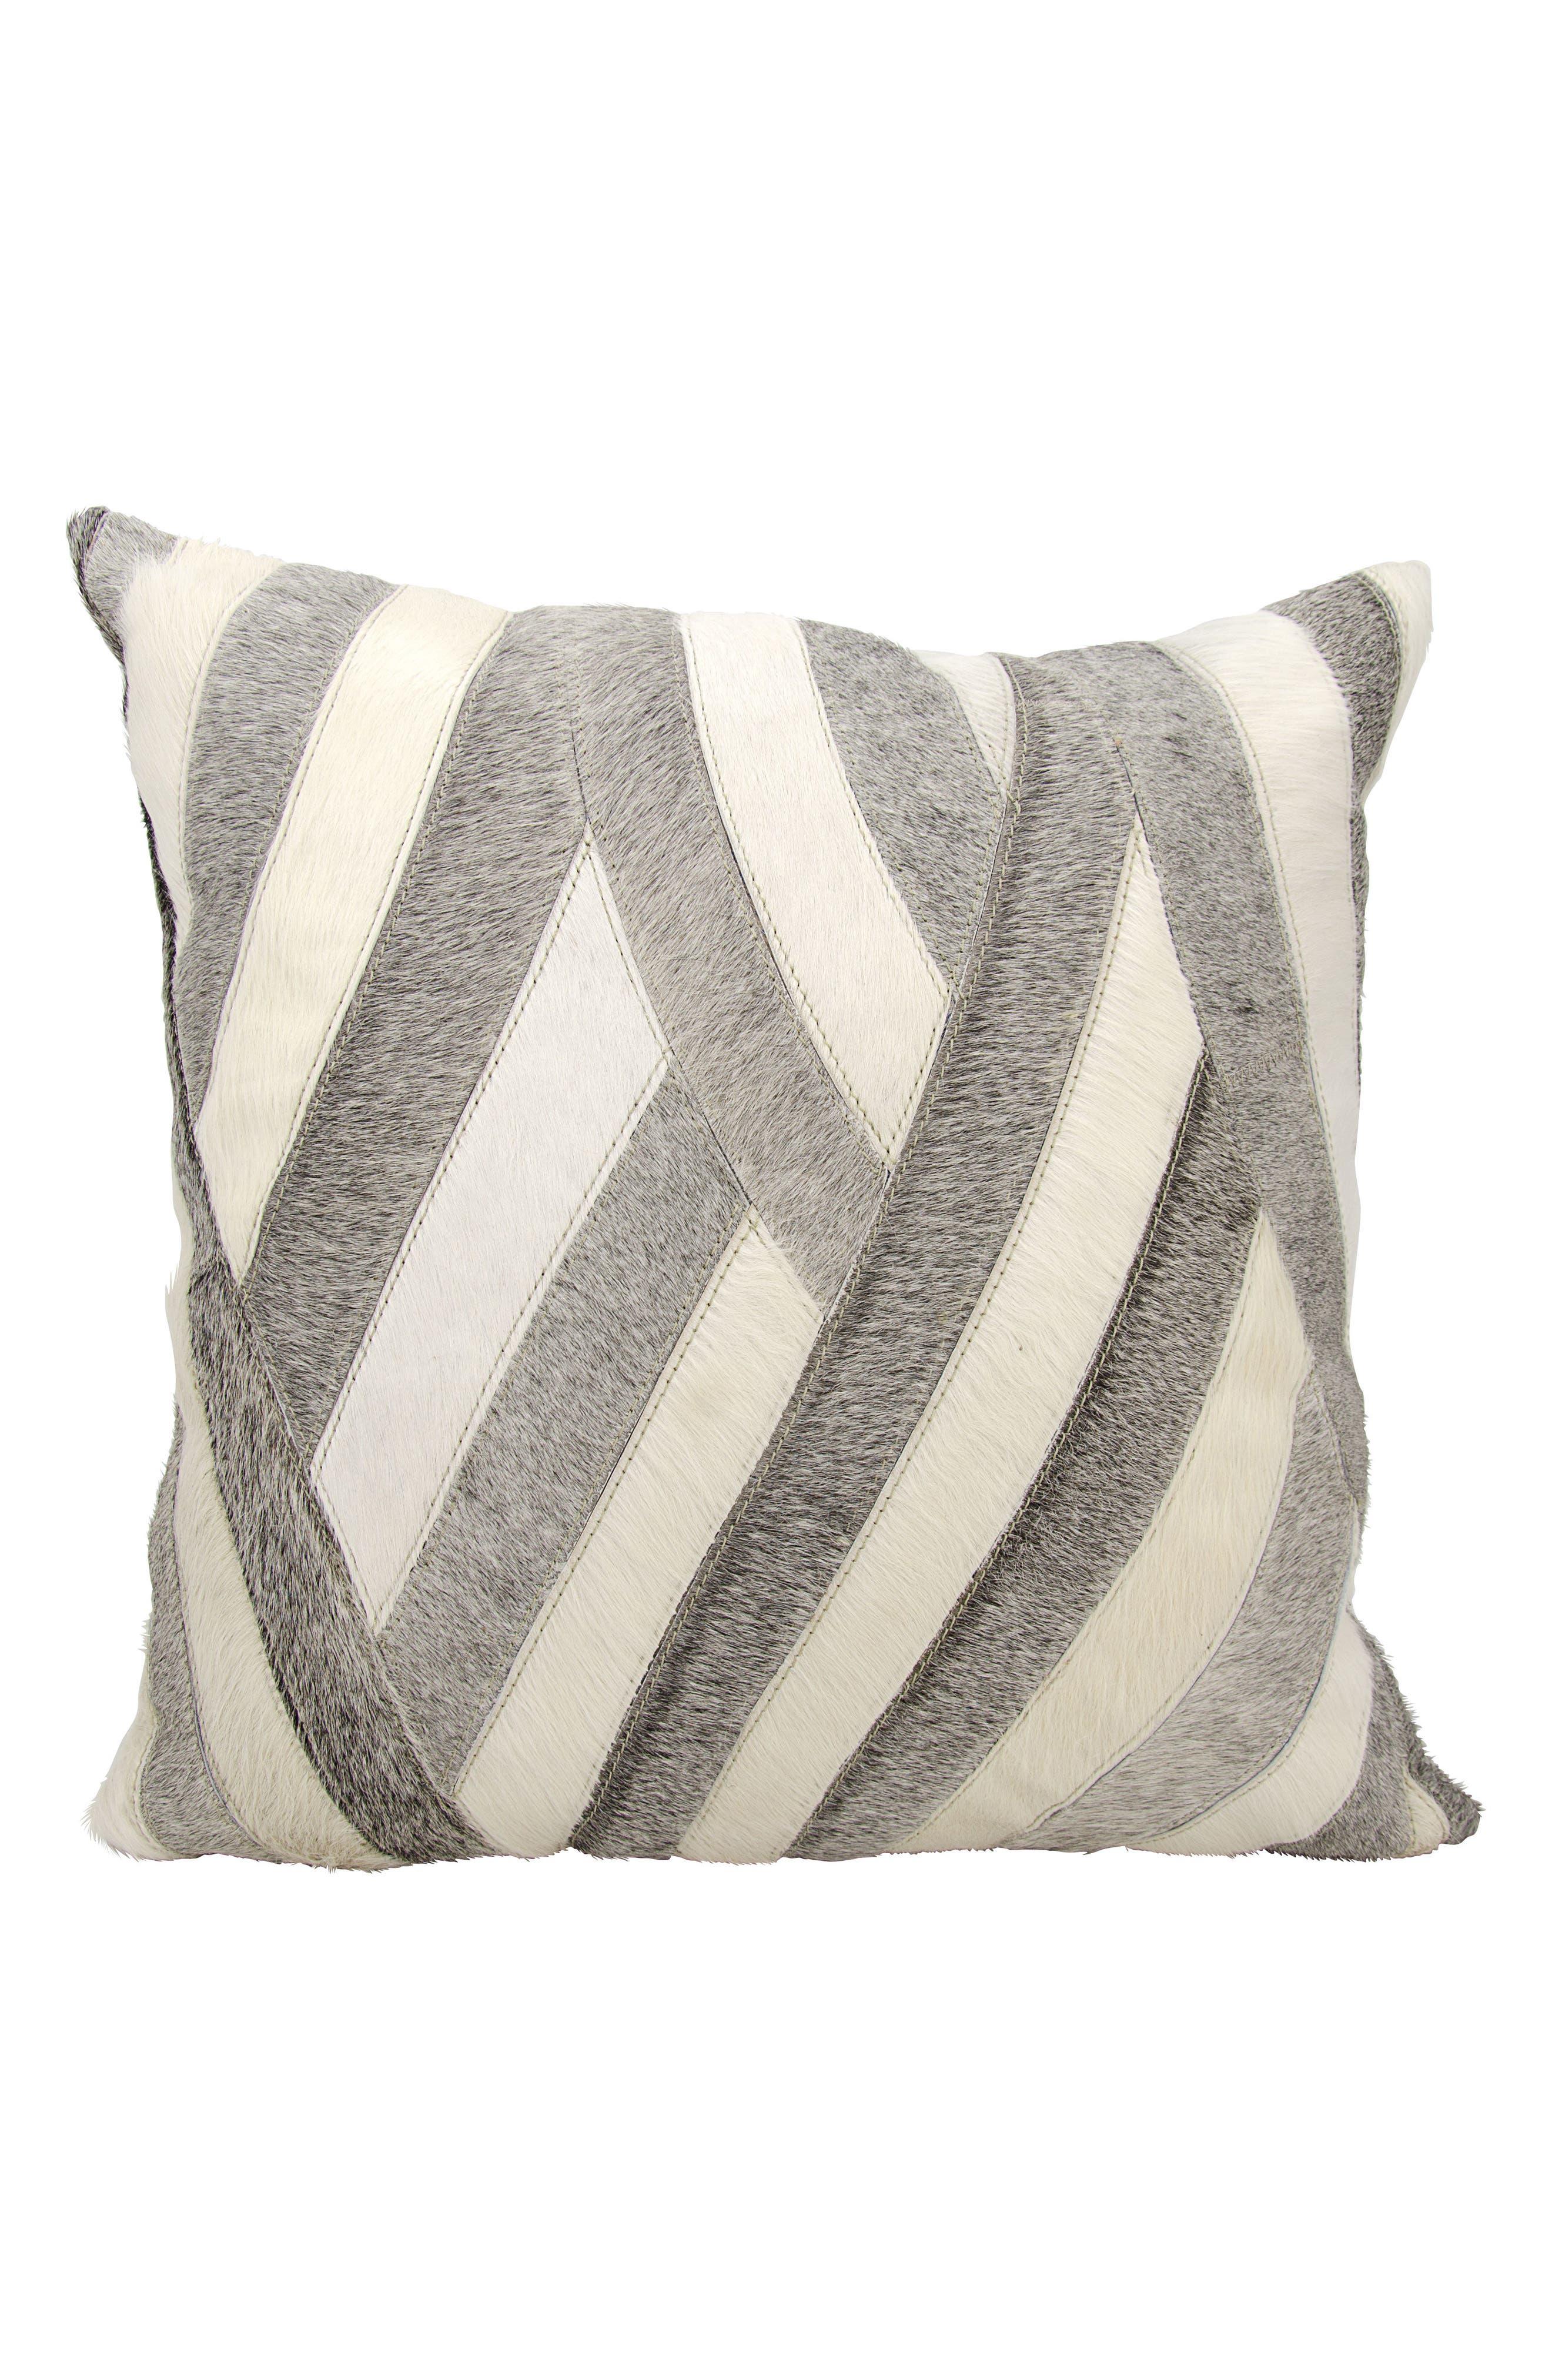 Mina Victory Wavy Stripes Genuine Calf Hair Accent Pillow